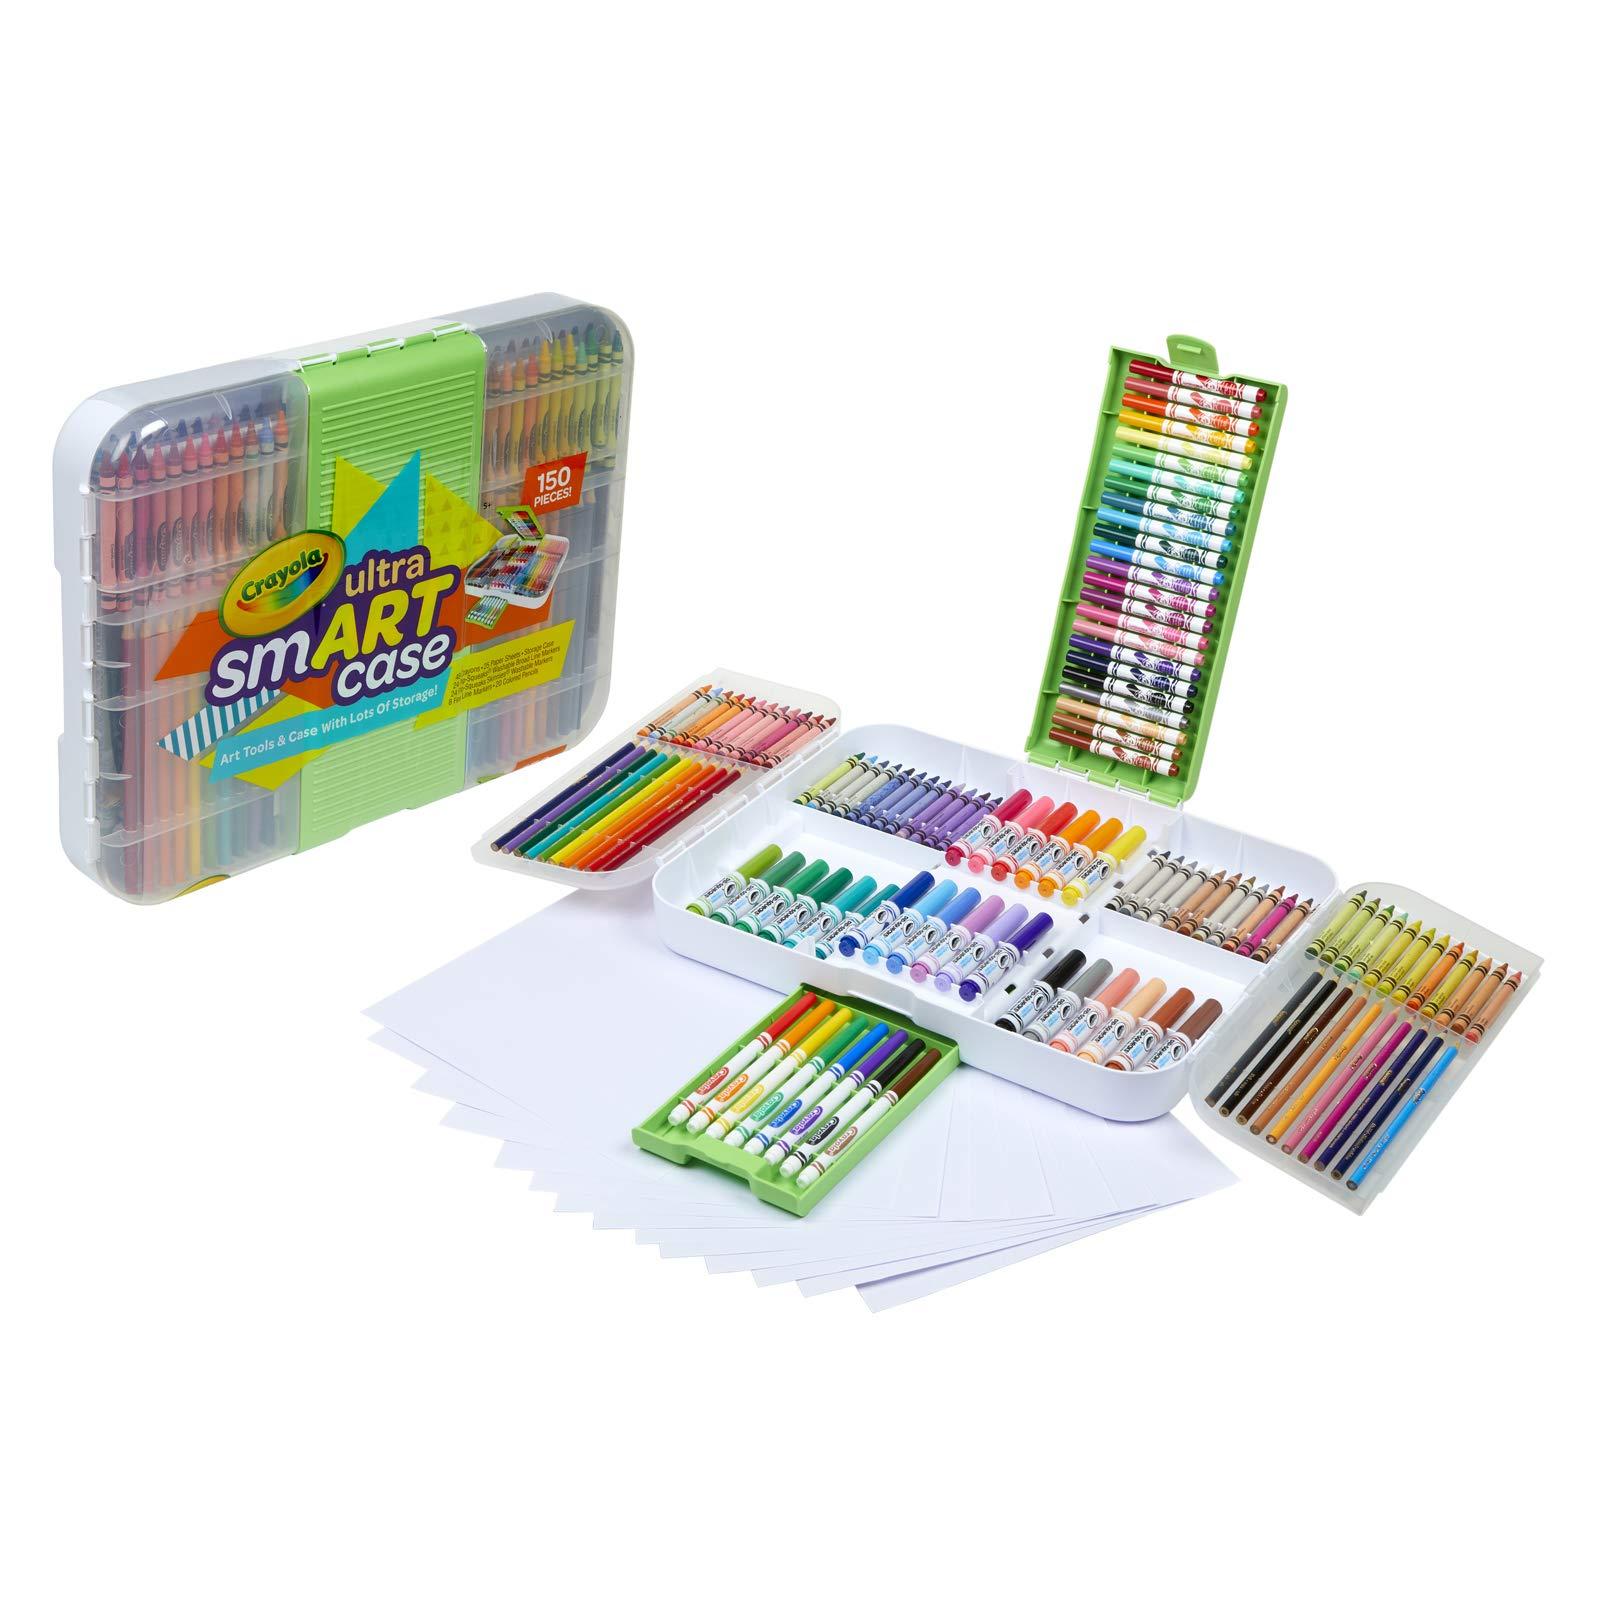 Crayola Ultra Smart Case Next Generation Art Set Age 6+